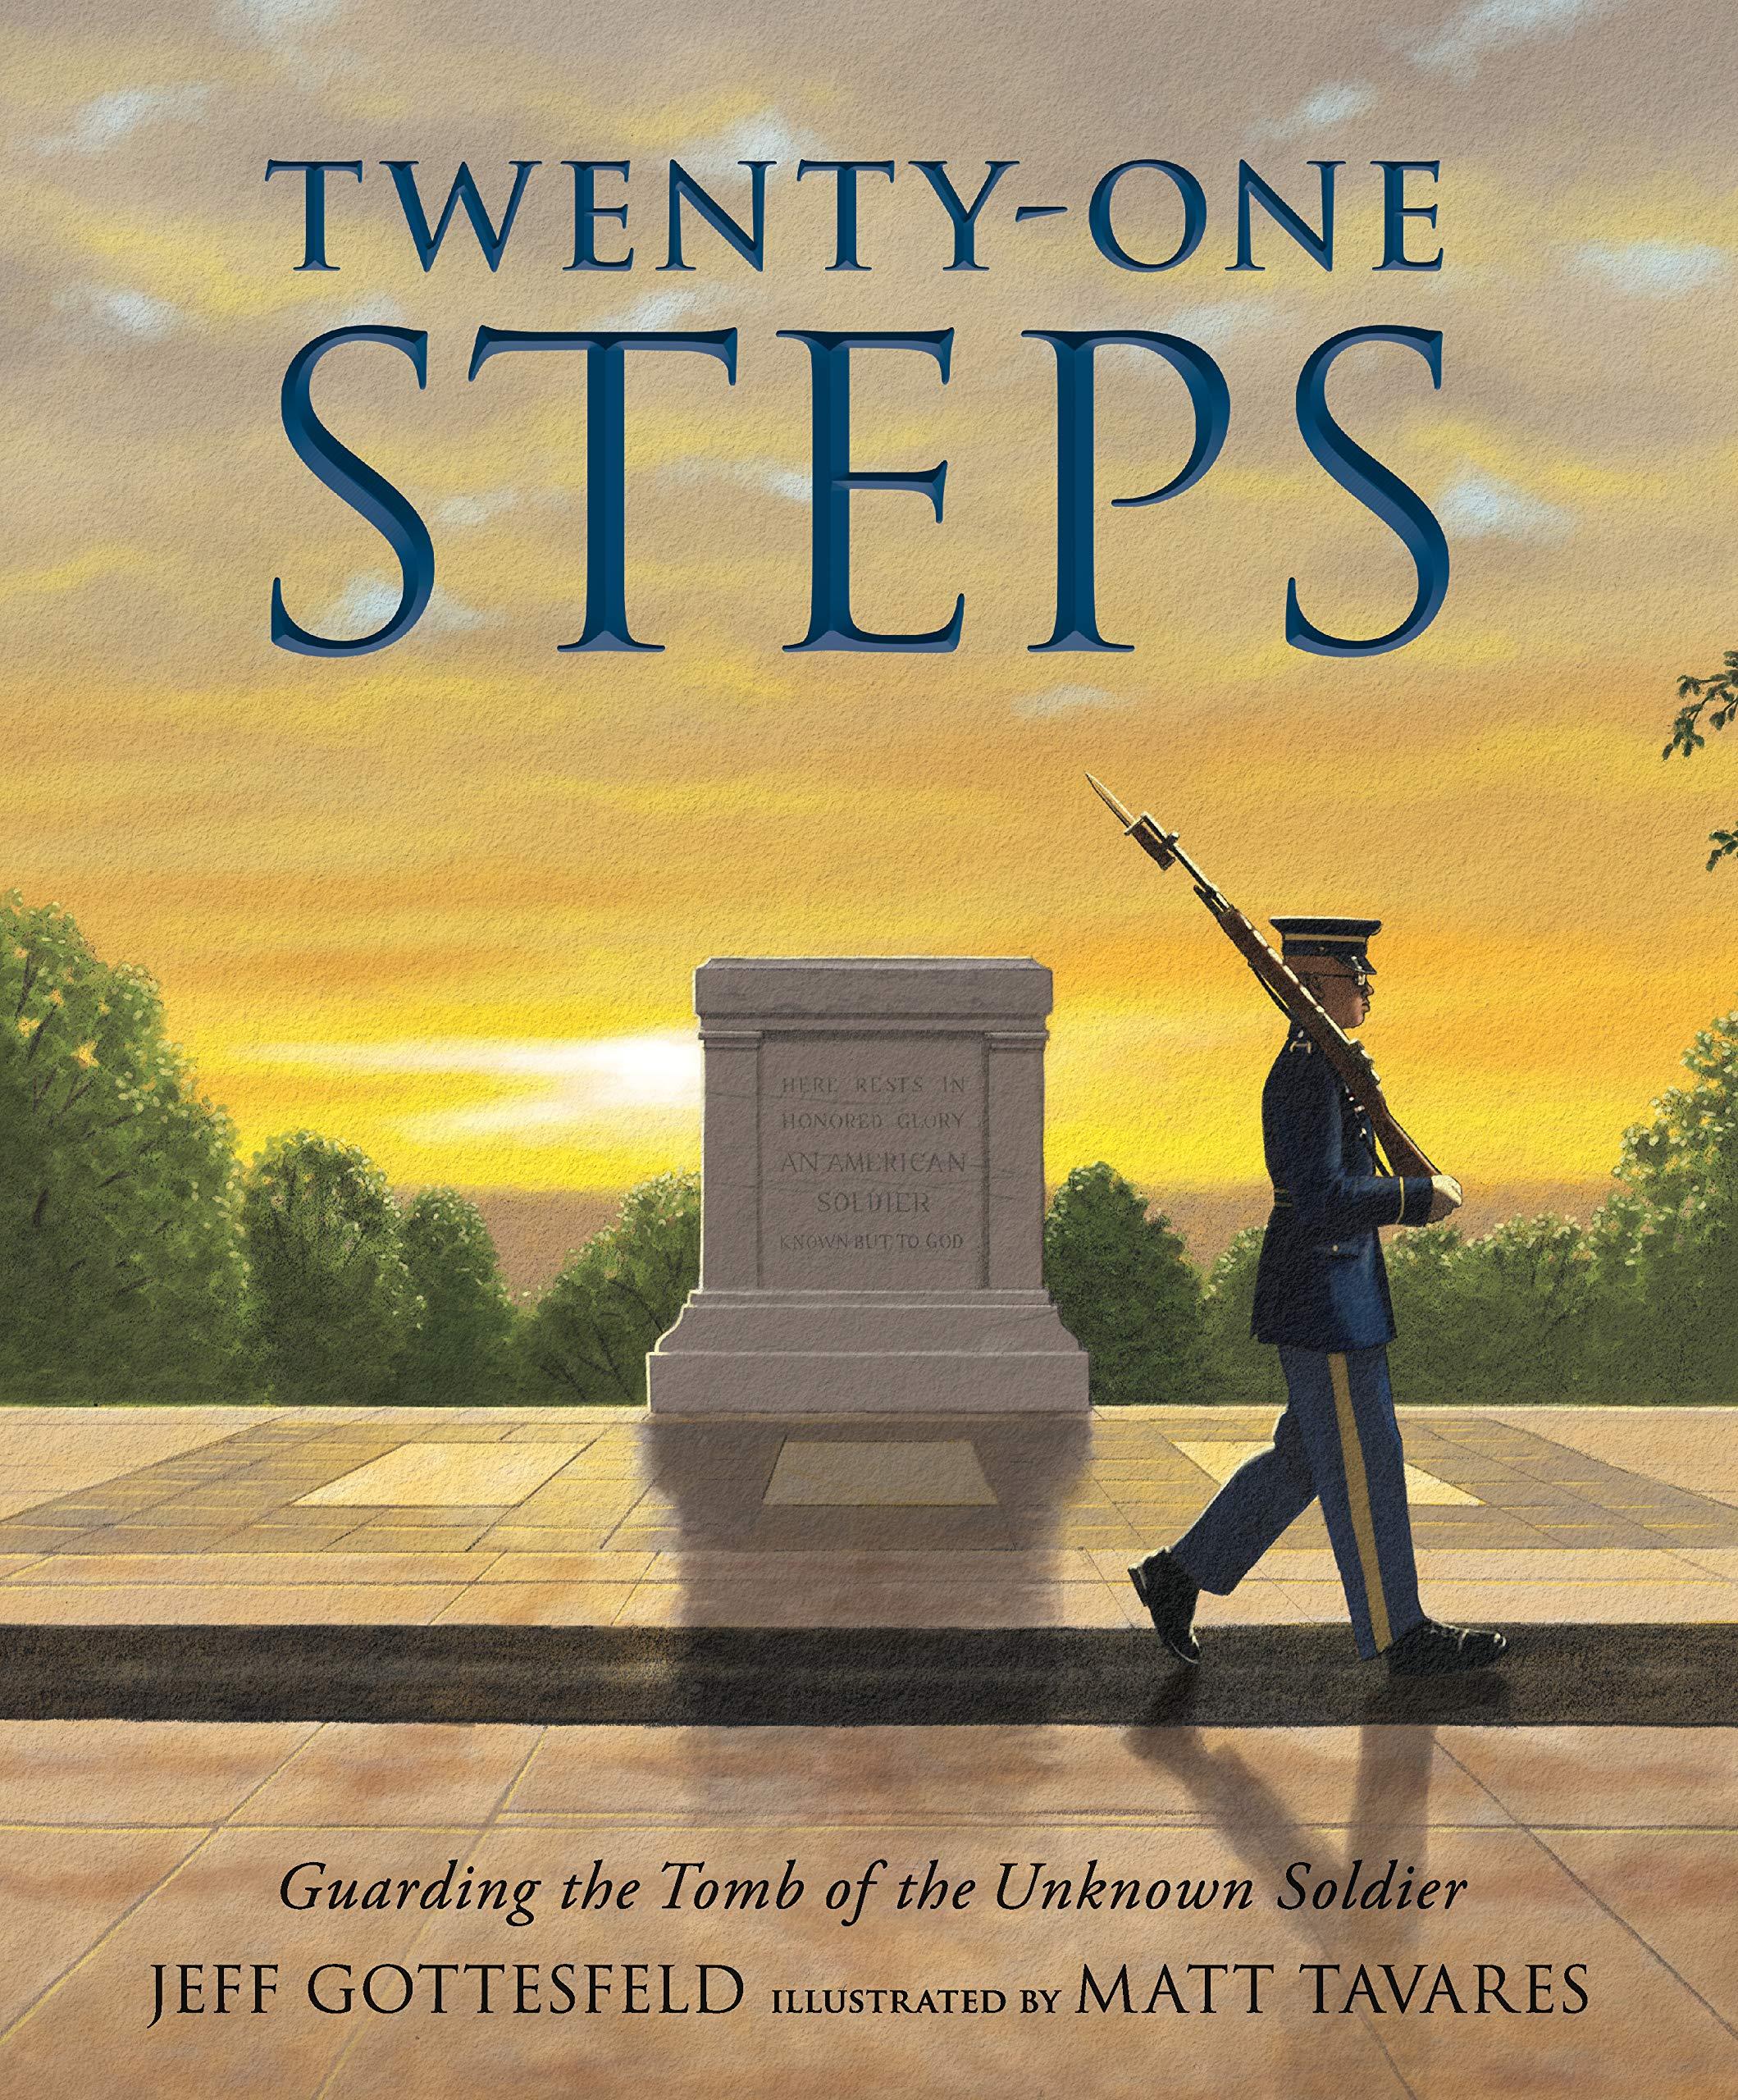 Twenty-One Steps: Guarding the Tomb of the Unknown Soldier: Gottesfeld,  Jeff, Tavares, Matt: 9781536201482: Amazon.com: Books